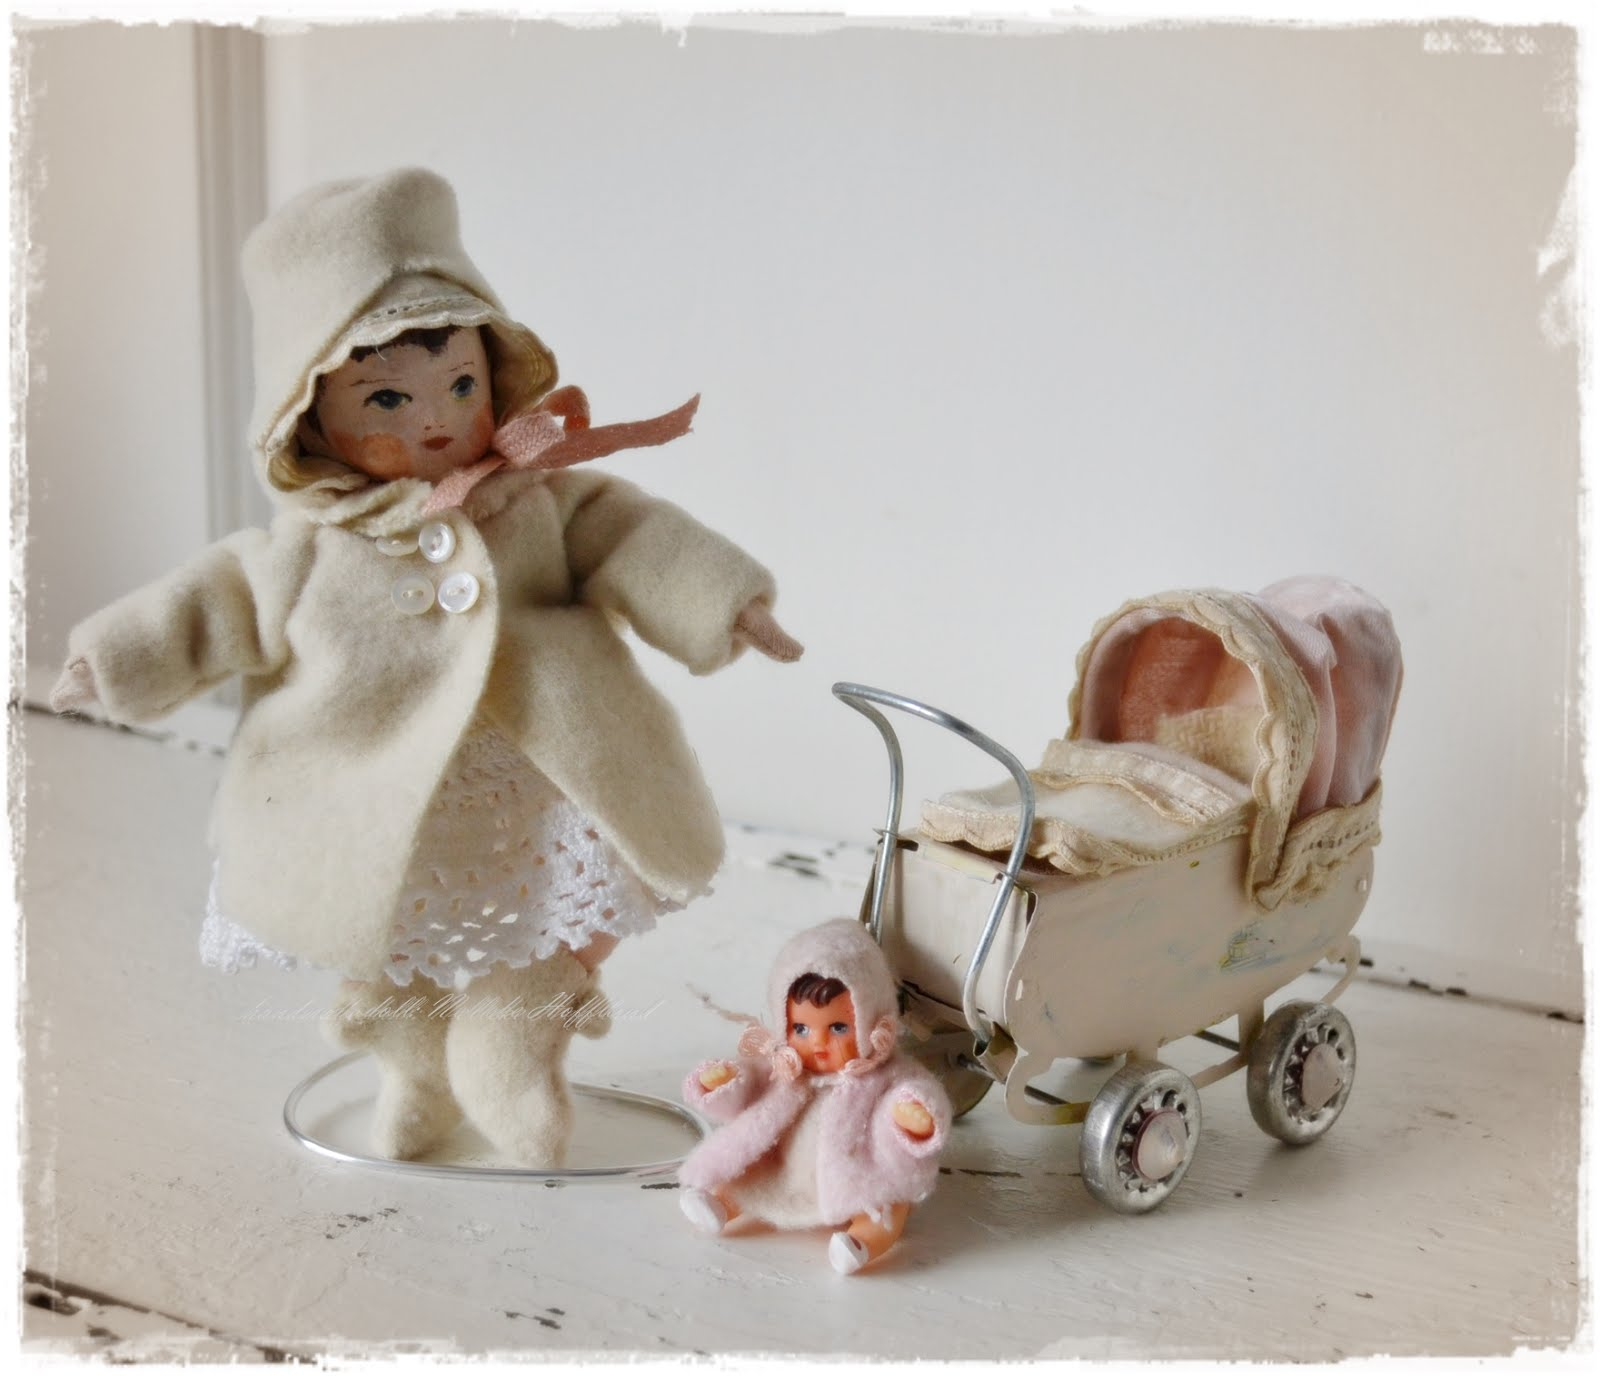 Klein popje met poppenwagentje